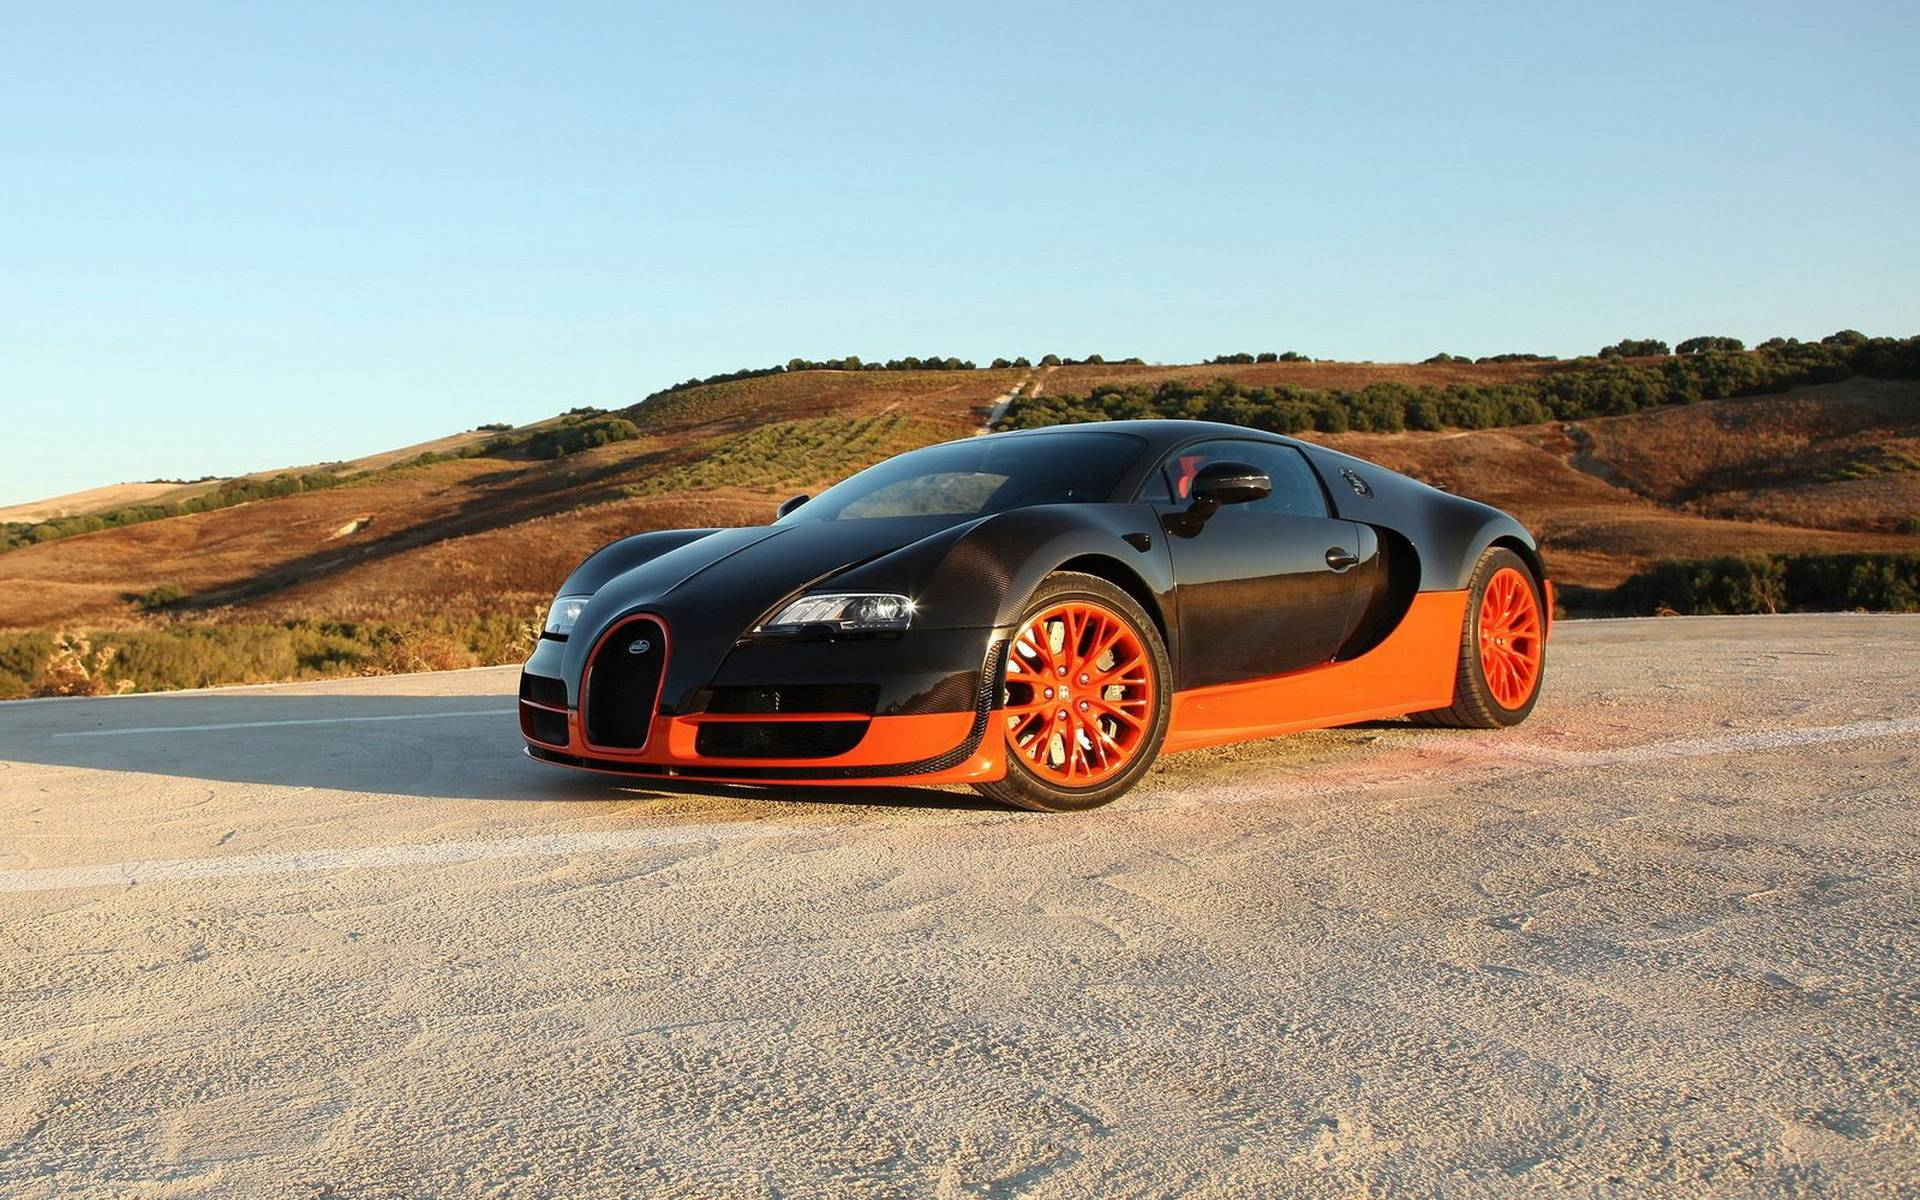 Blue Bugatti Veyron Super Sport Wallpaper